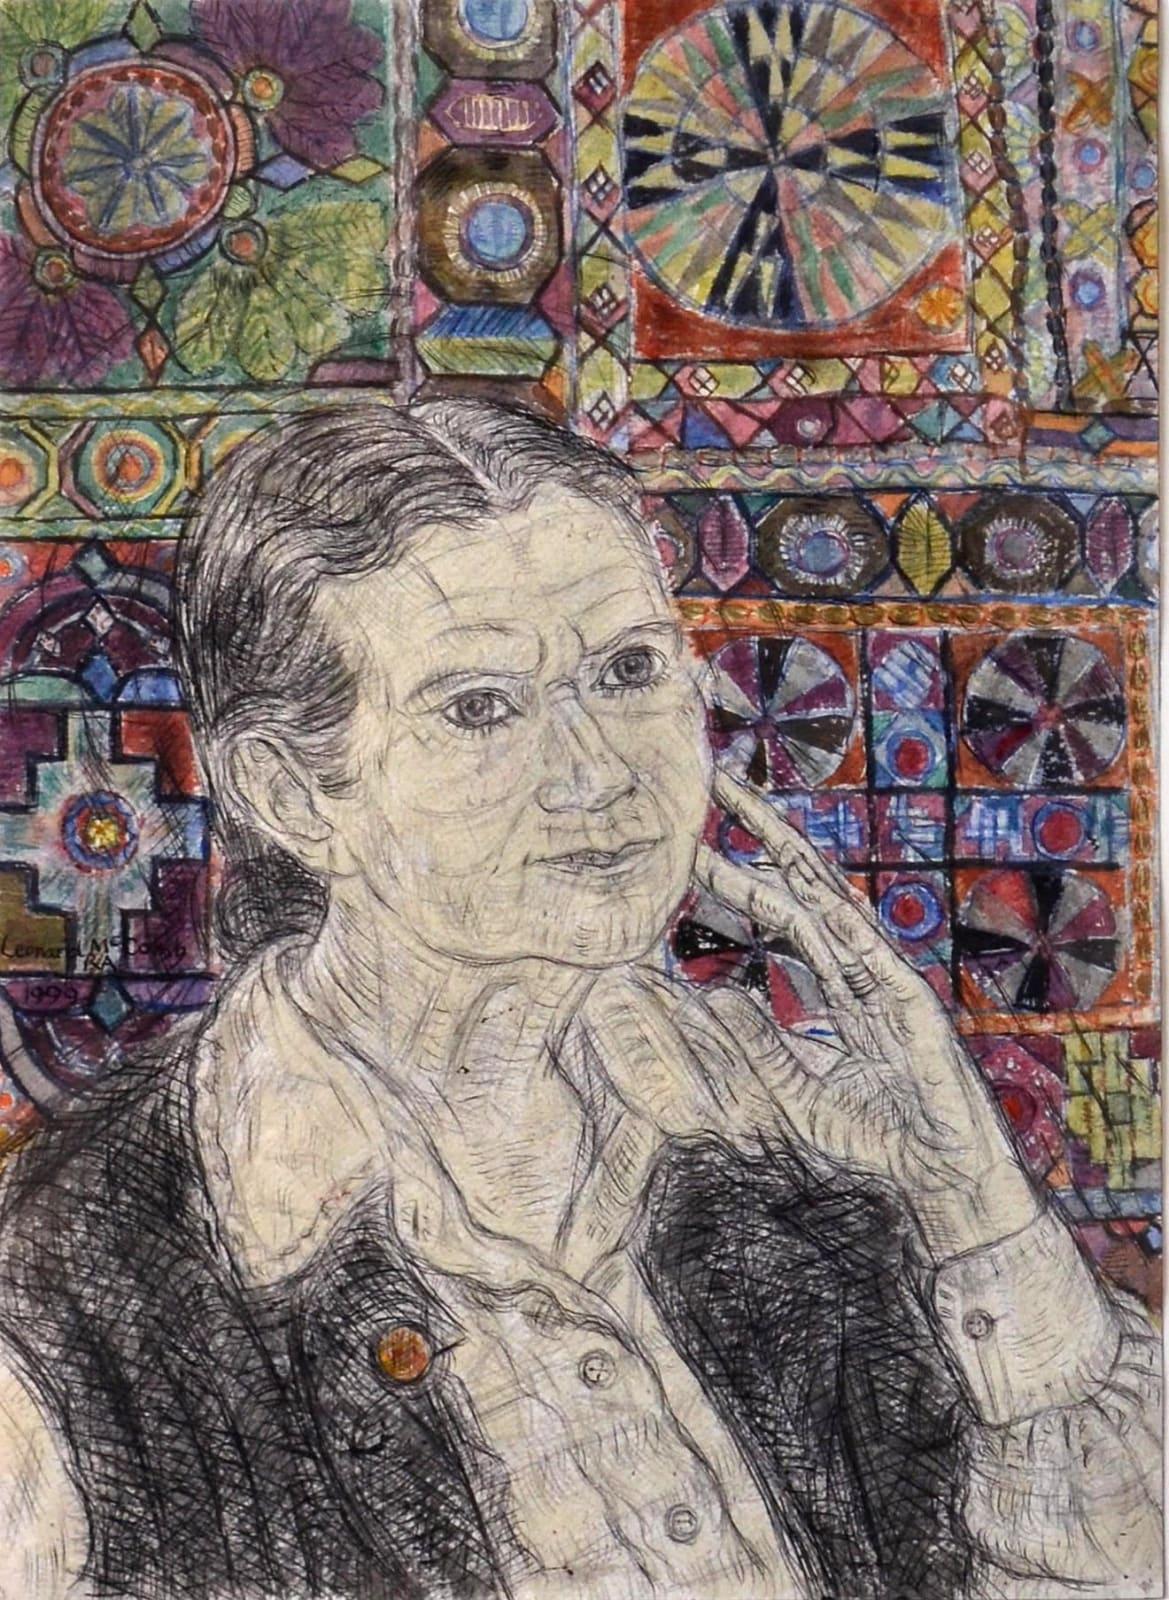 Leonard Mccomb, Portrait of Doris Lessing, 1999